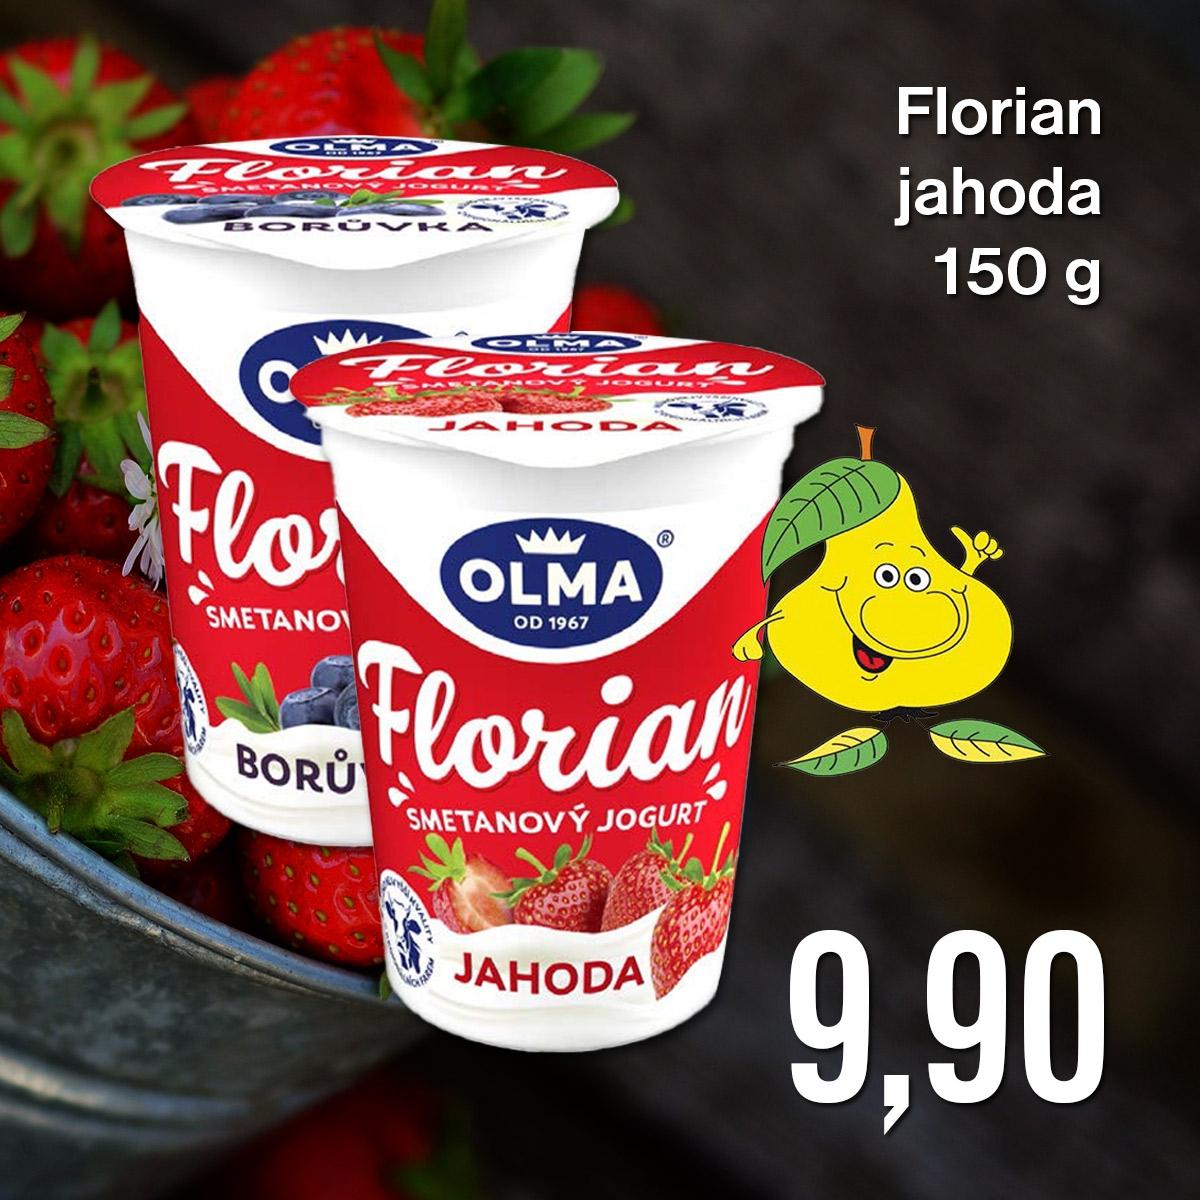 Florian jahoda 150 g